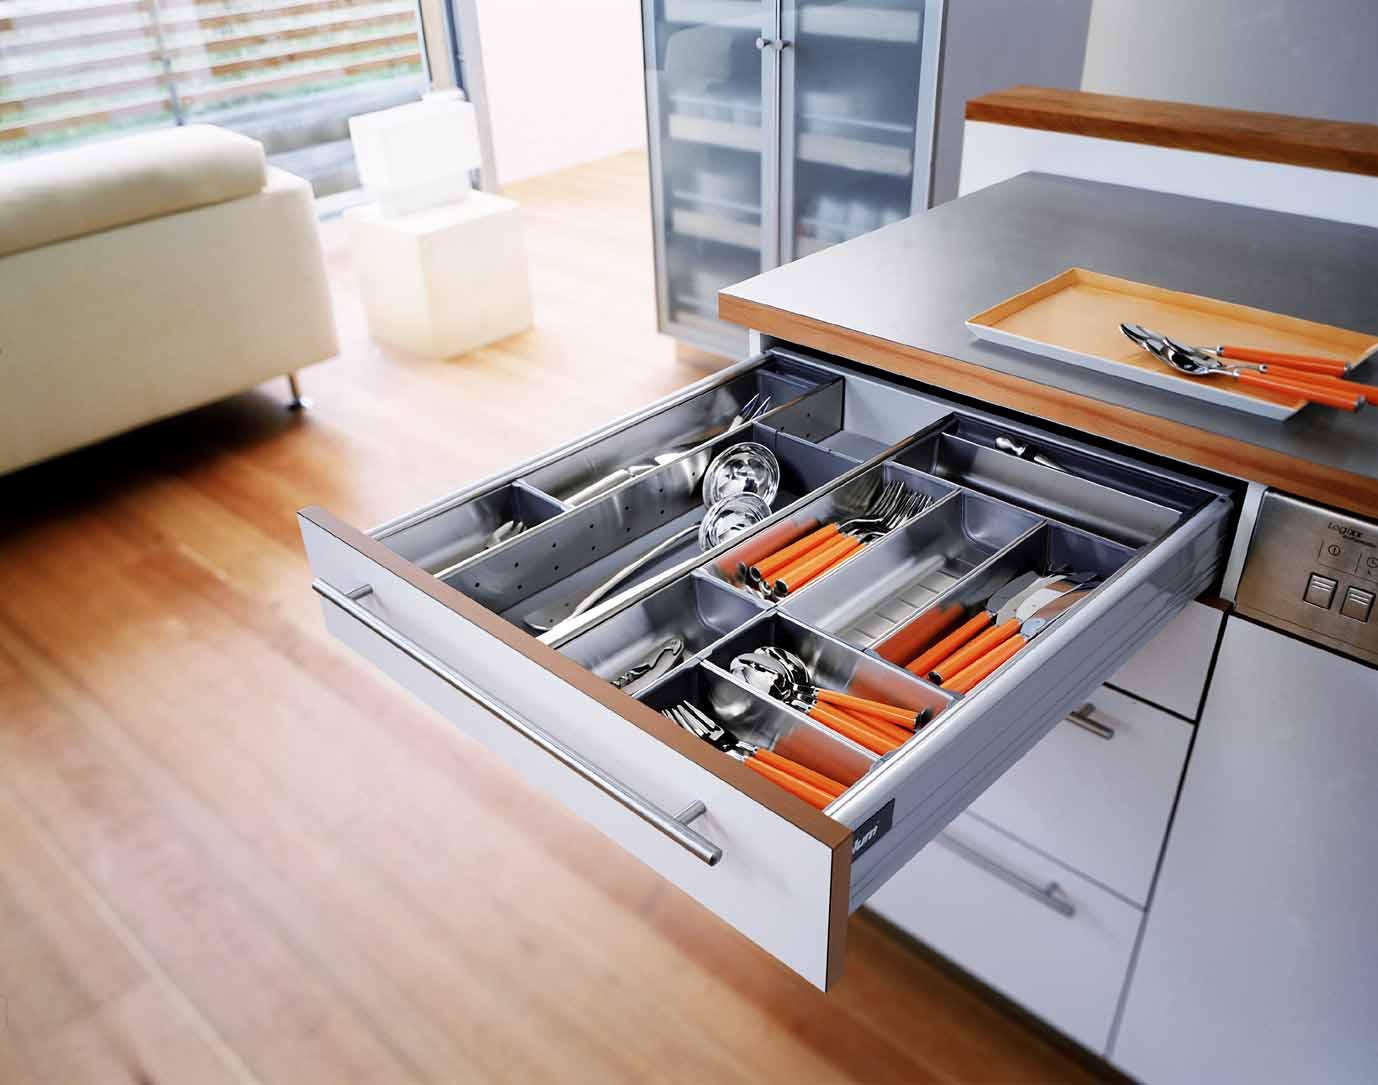 blum фурнитура для мебели кухни фото